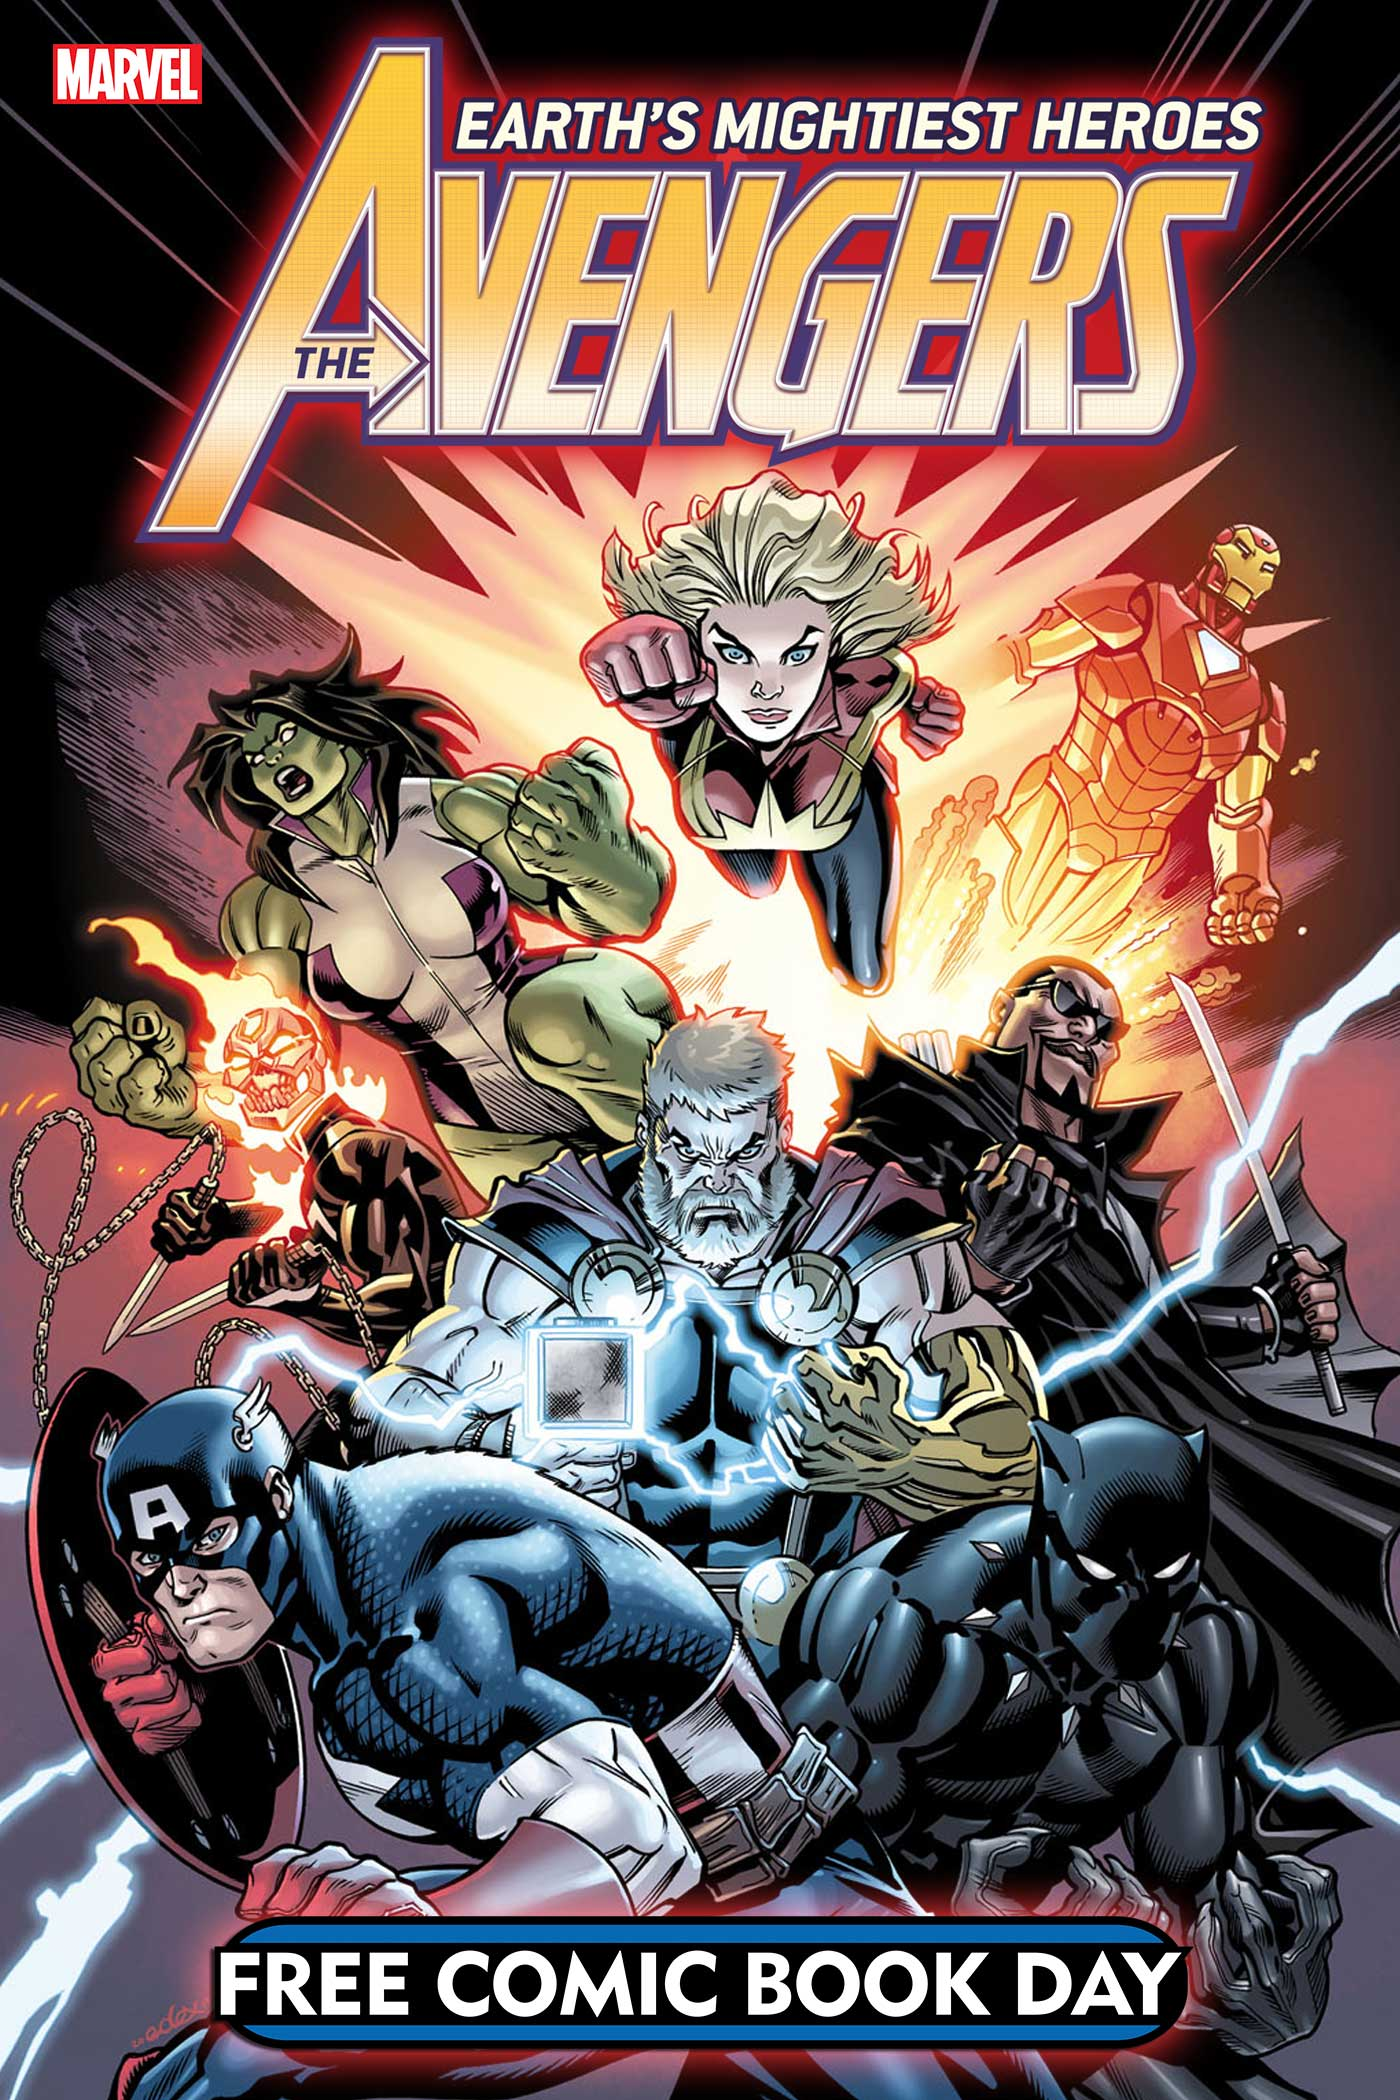 Free Comic Book Day, FCBD, Marvel, Avengers